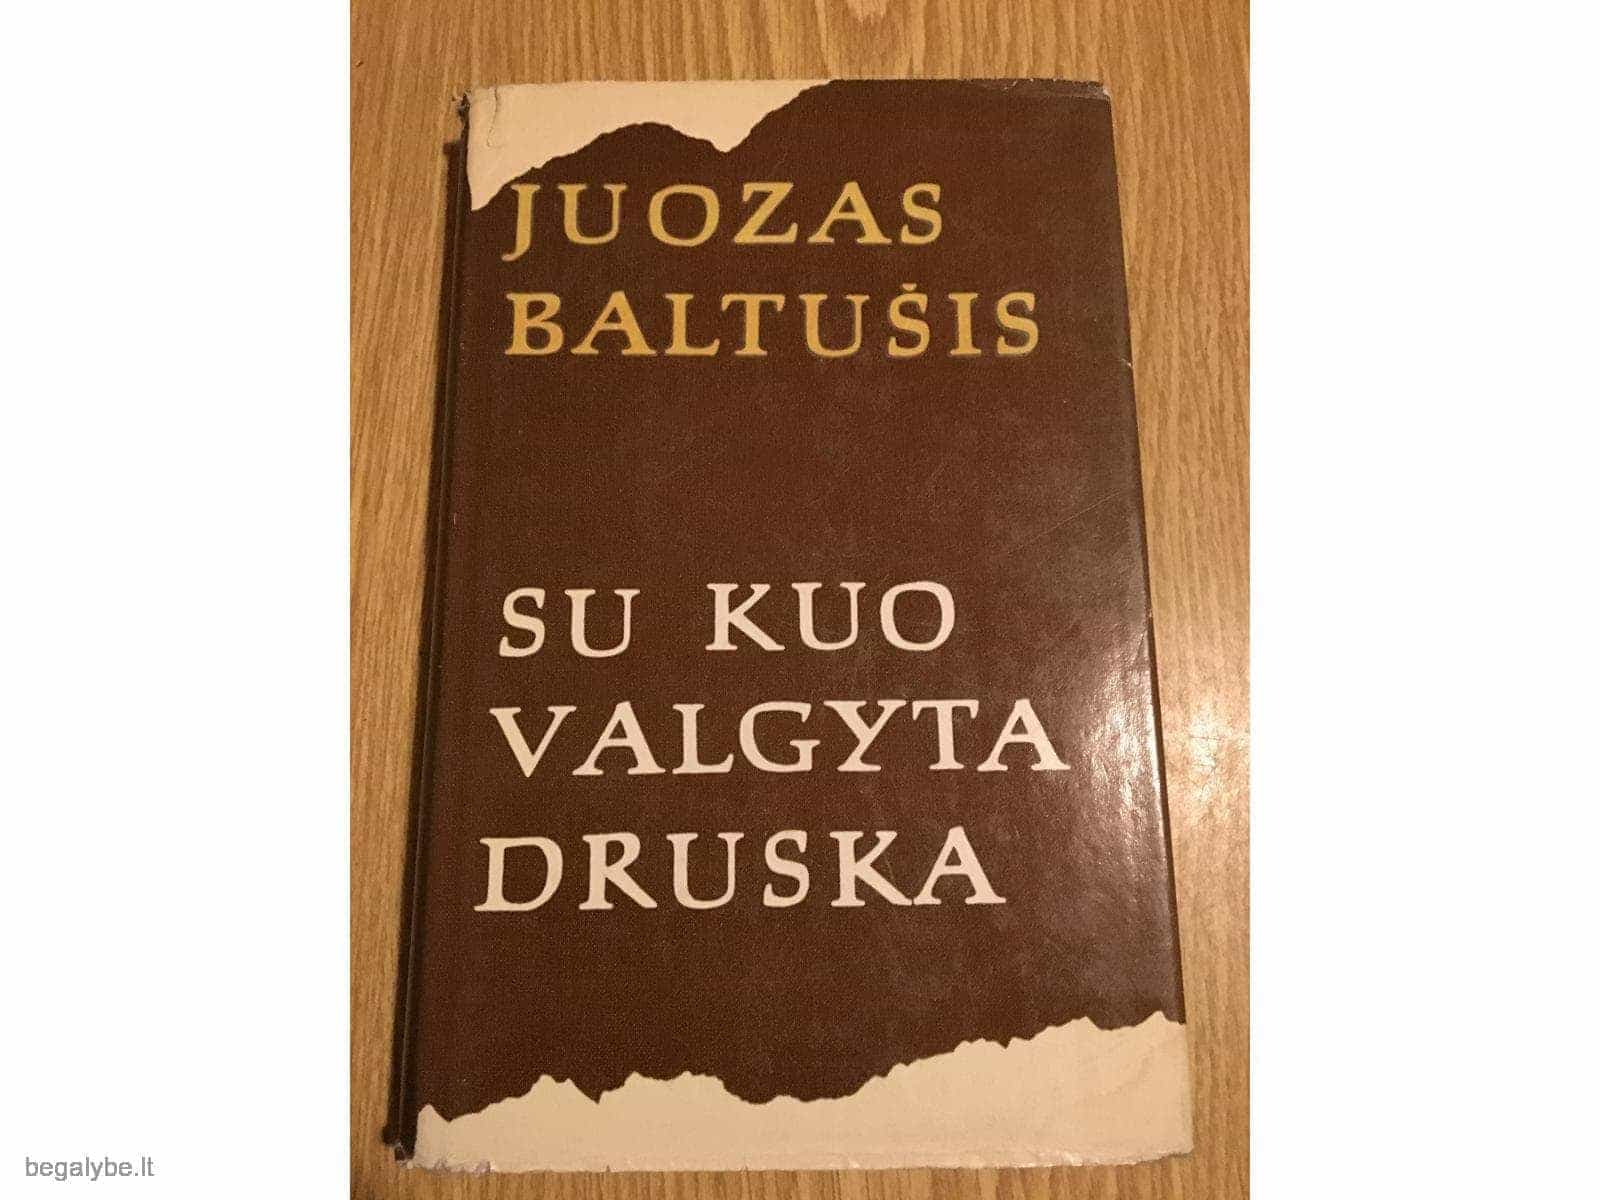 Juozas Baltušis - Su kuo valgyta druska